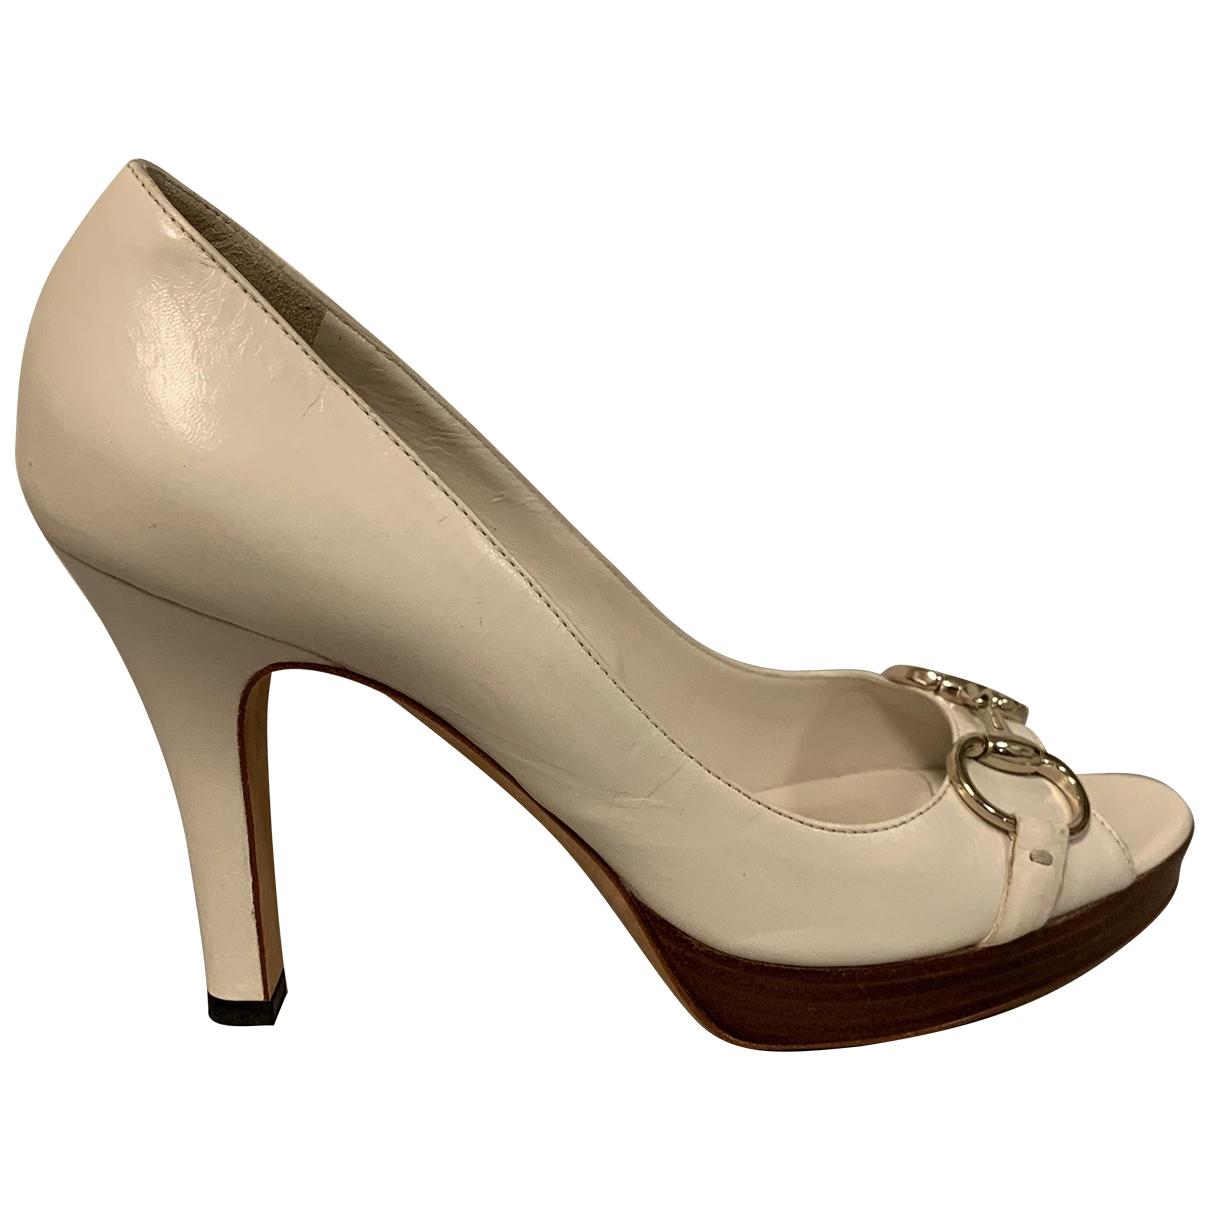 Gucci \N Beige Leather Heels for Women 38.5 EU